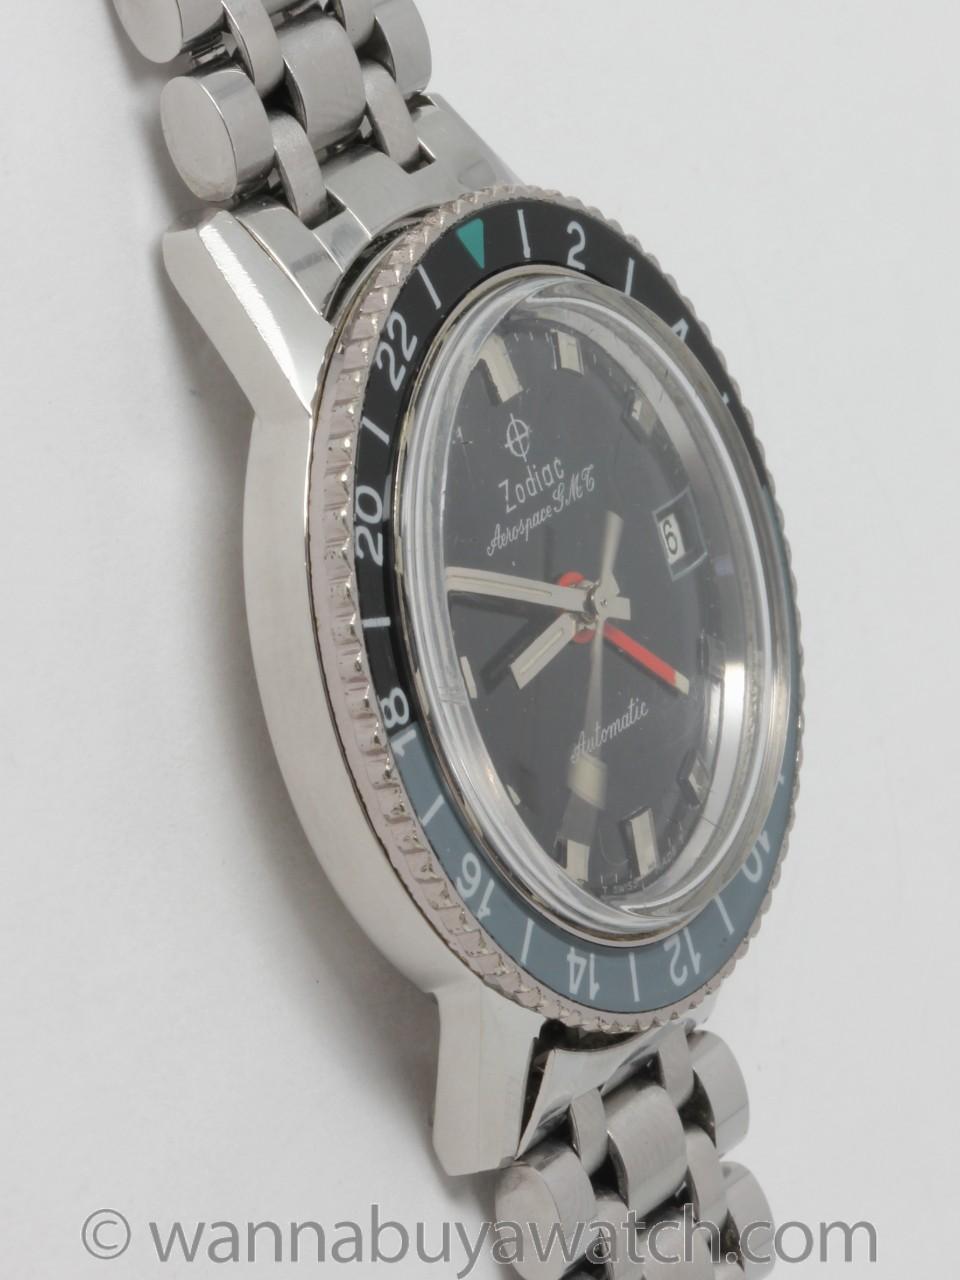 Zodiac SS Aerospace GMT Automatic circa 1960's